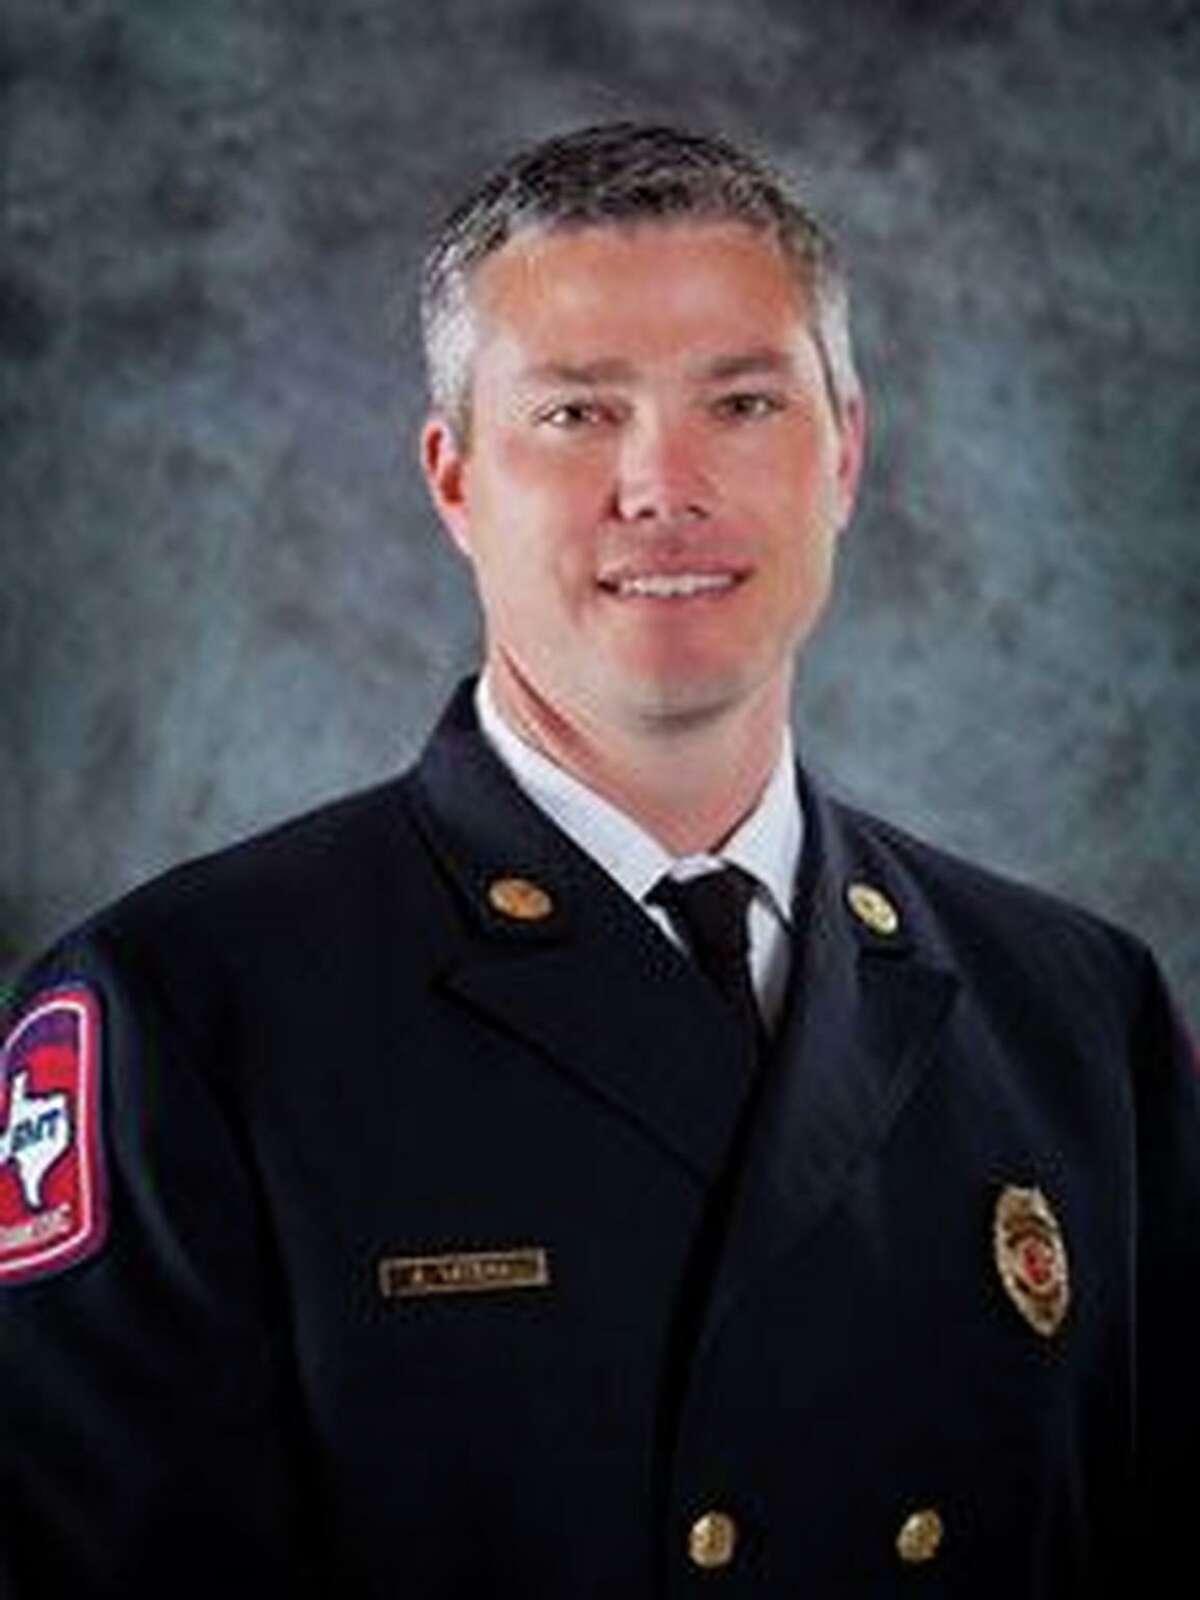 West U Fire Chief Aaron Taylor